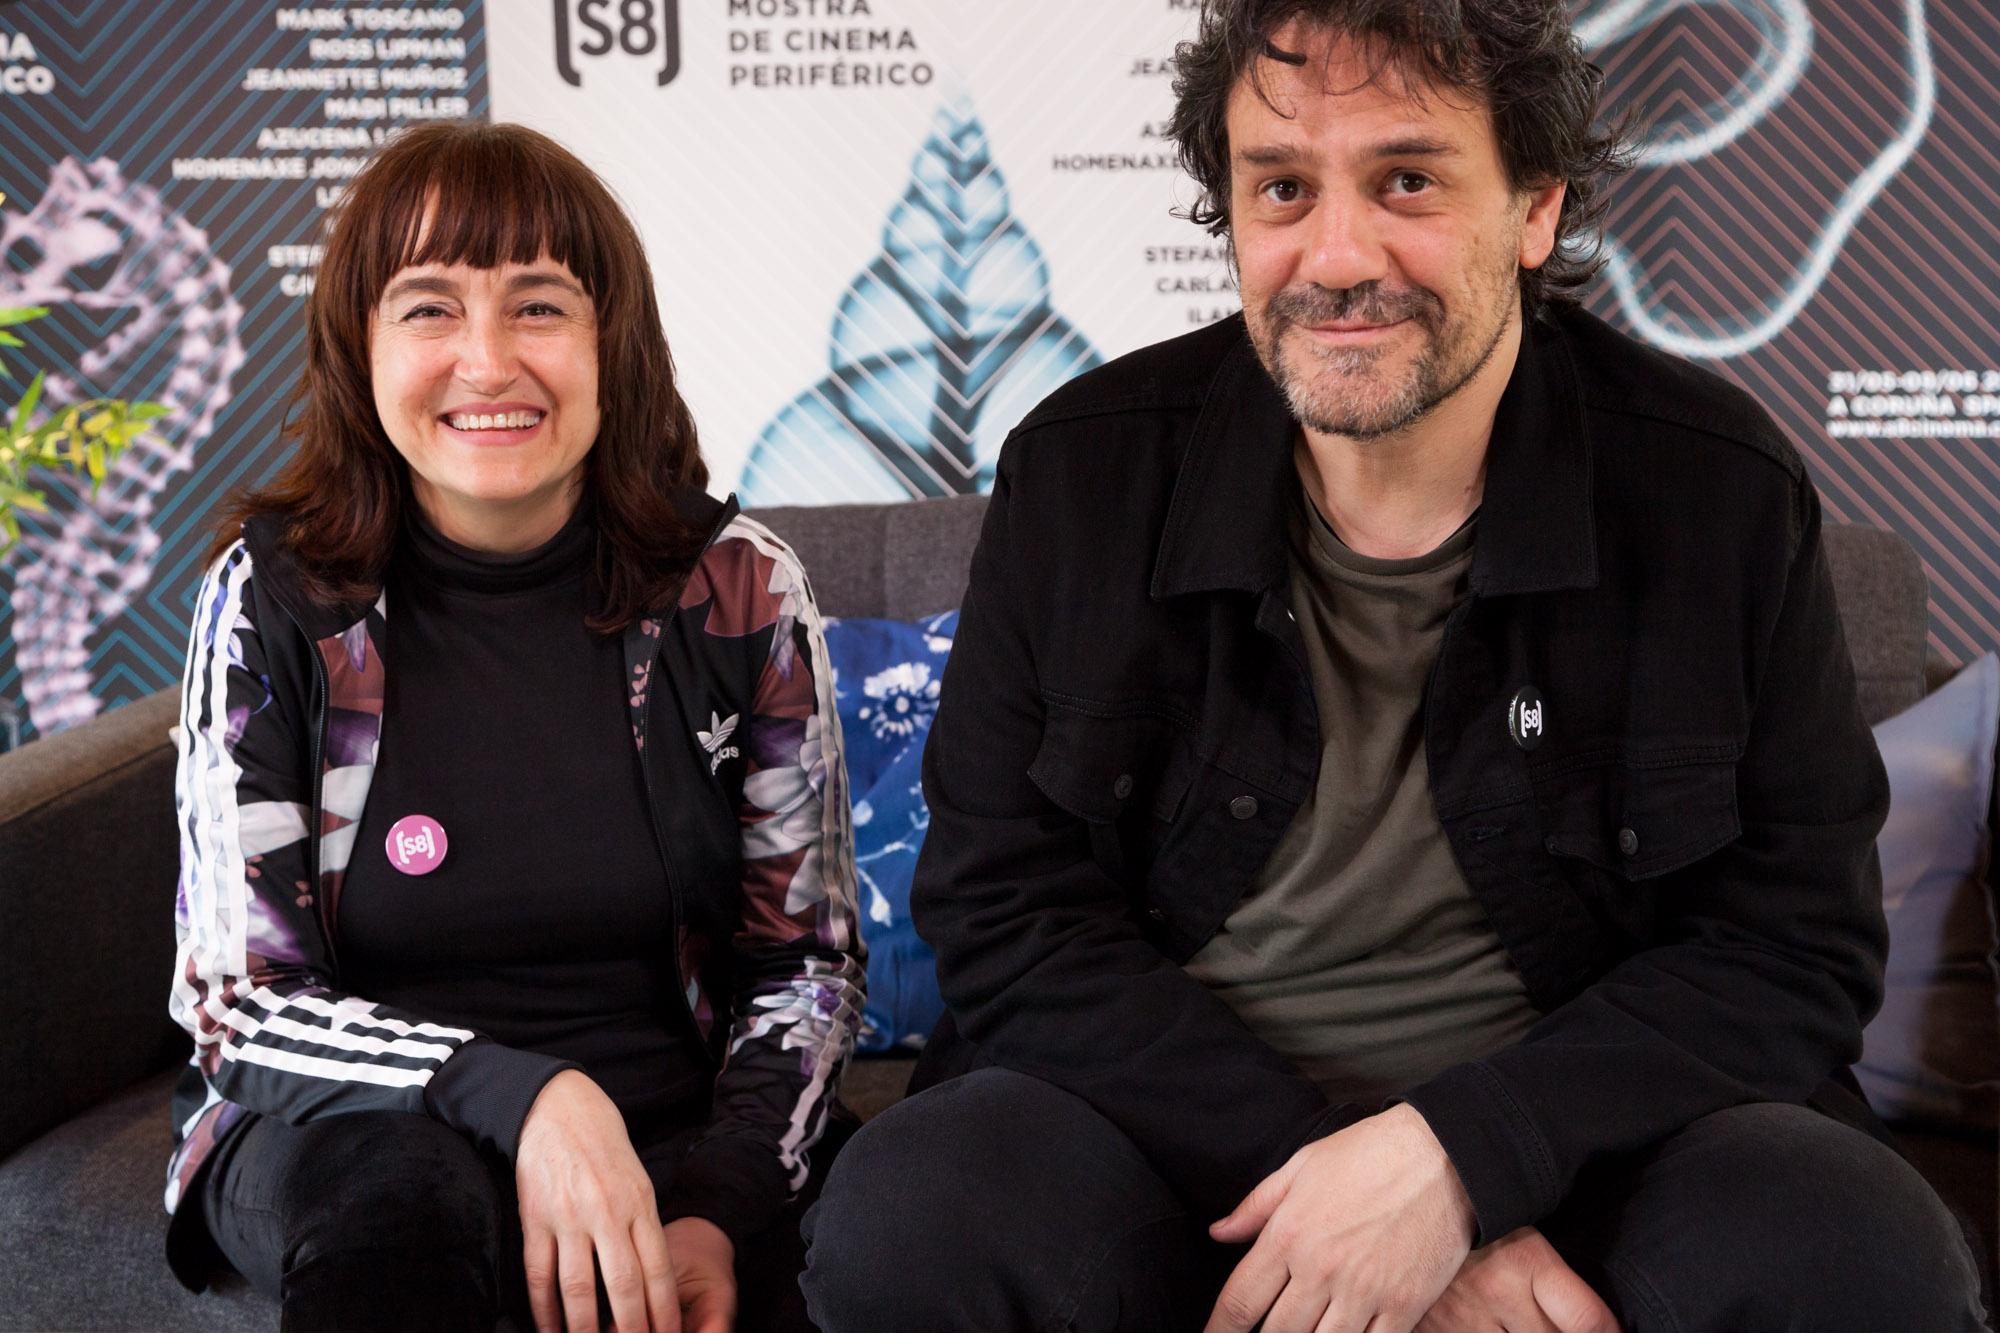 Ana Domínguez y Ángel Rueda. Unha utopía que xa dura dez ...